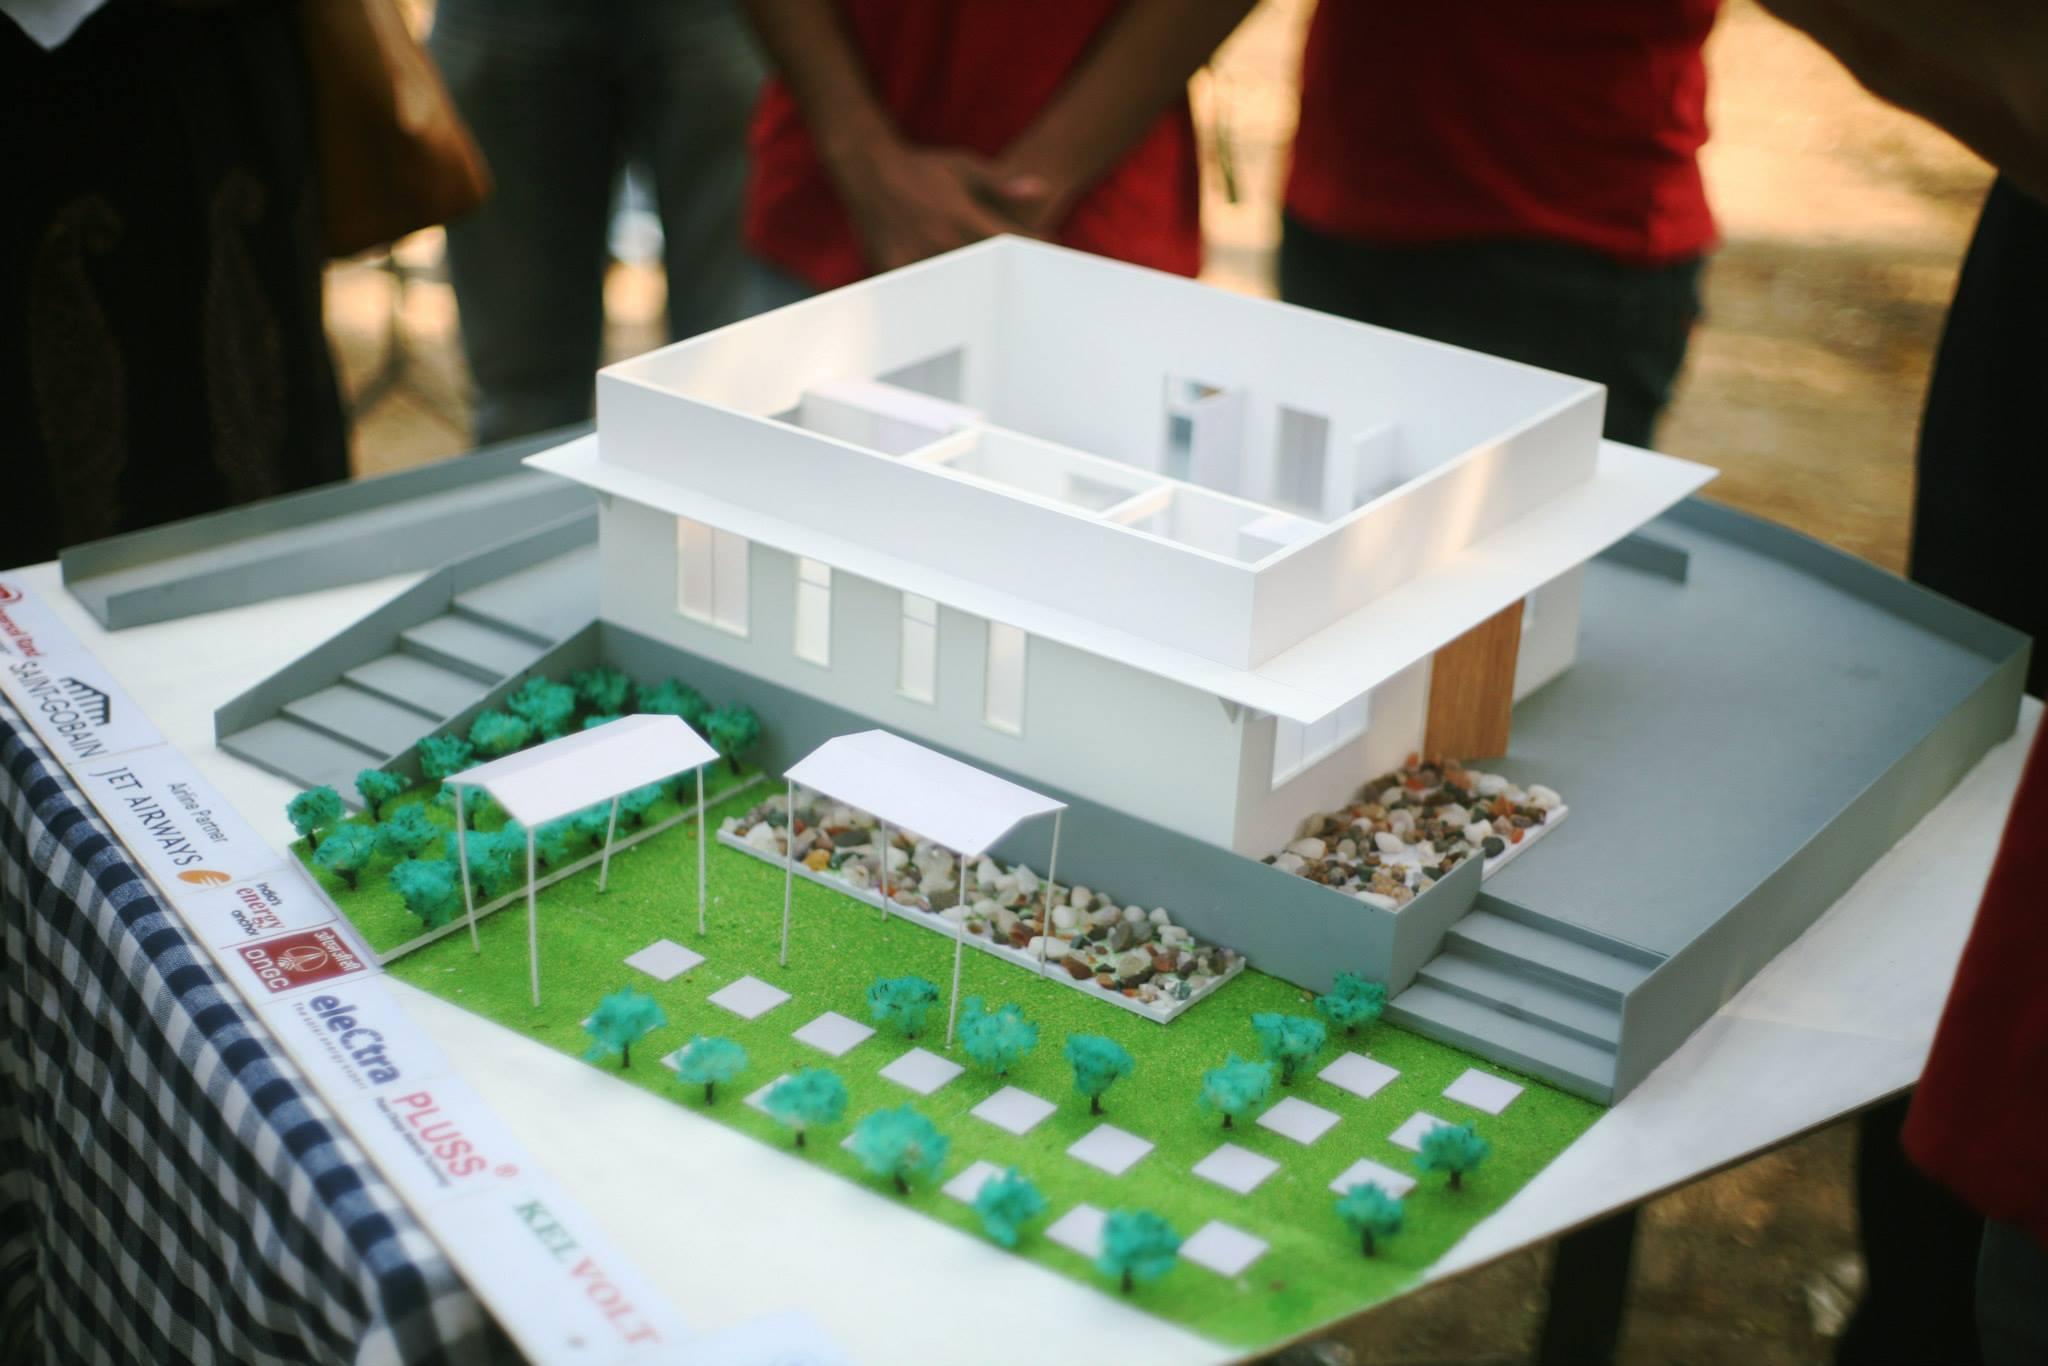 Project Solarise, Sustainable Housing Development, Solar Energy, Energy-Efficiency, Team Shunya, IIT-B